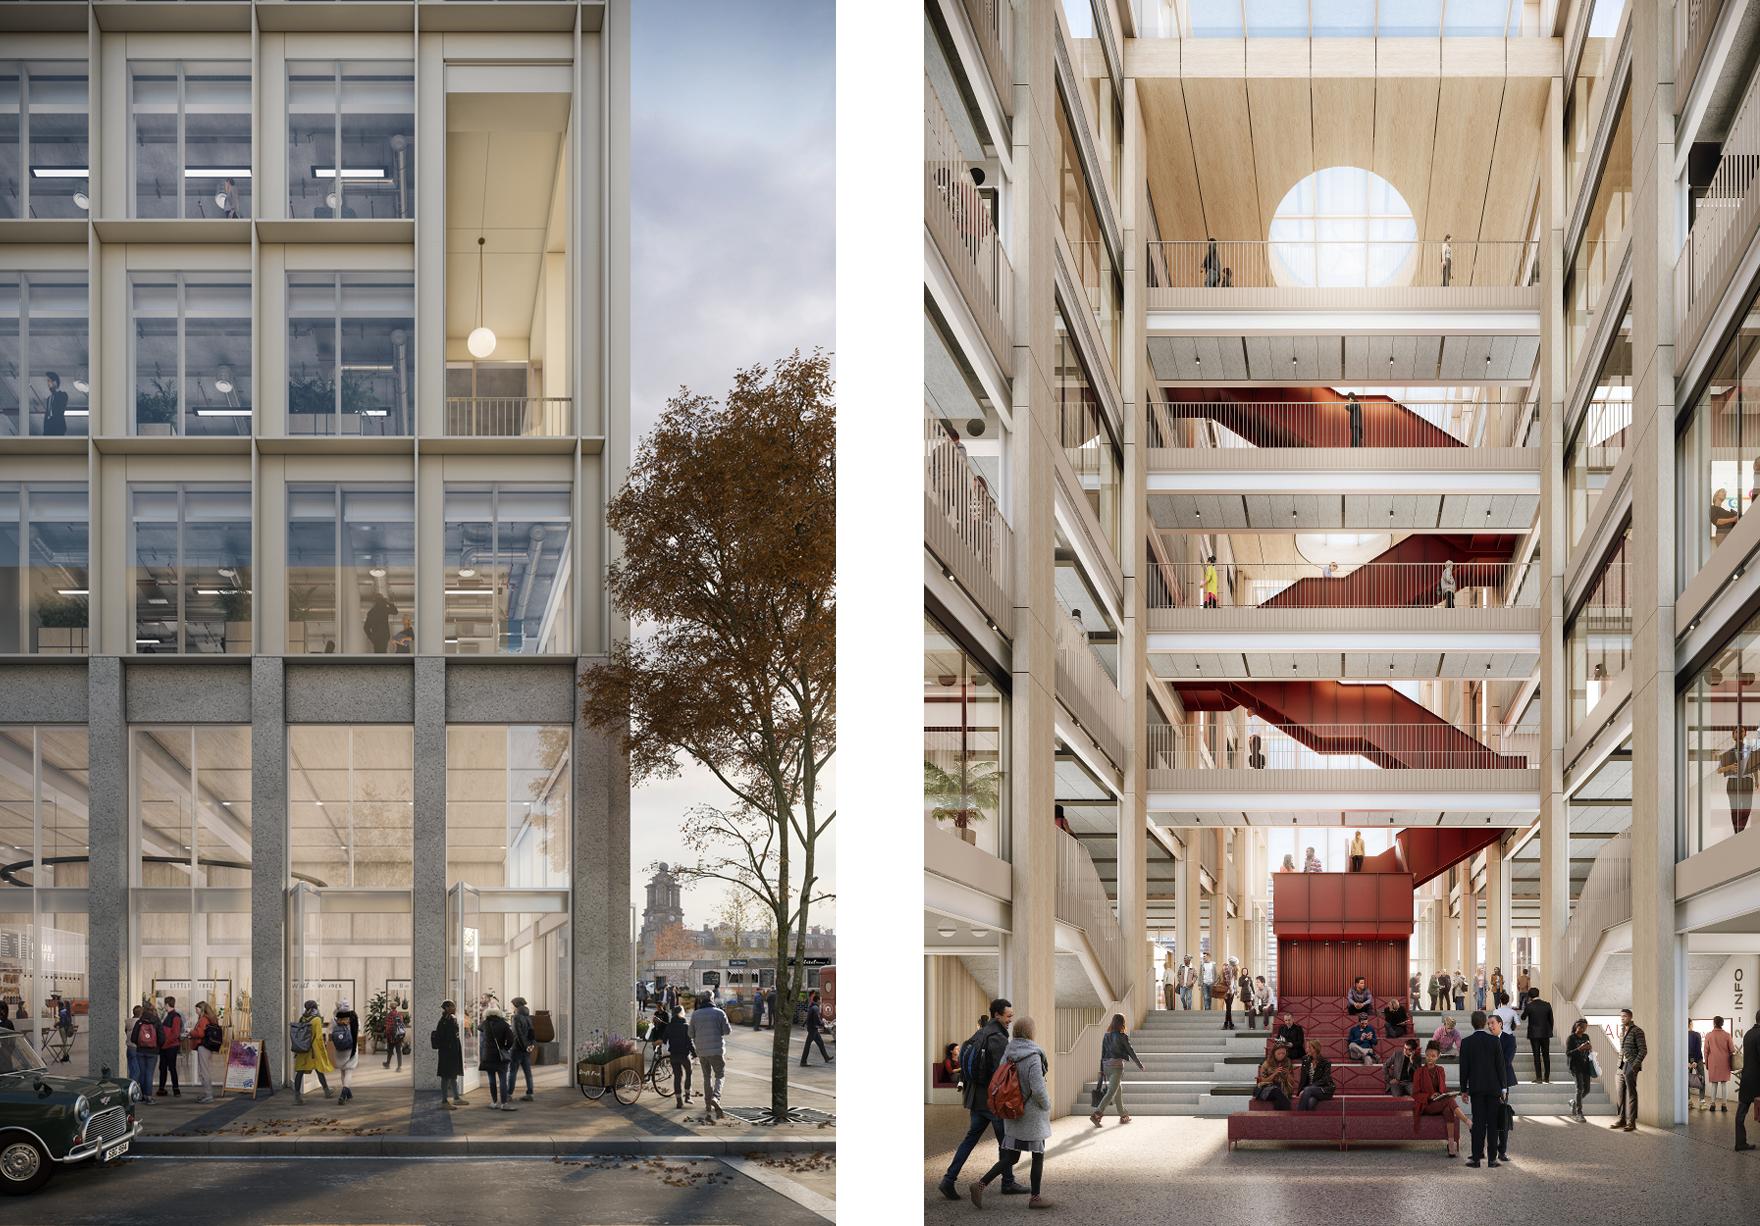 Vaux City Hall Construction Begins Sunderland Faulknerbrowns Architects 2 Lh